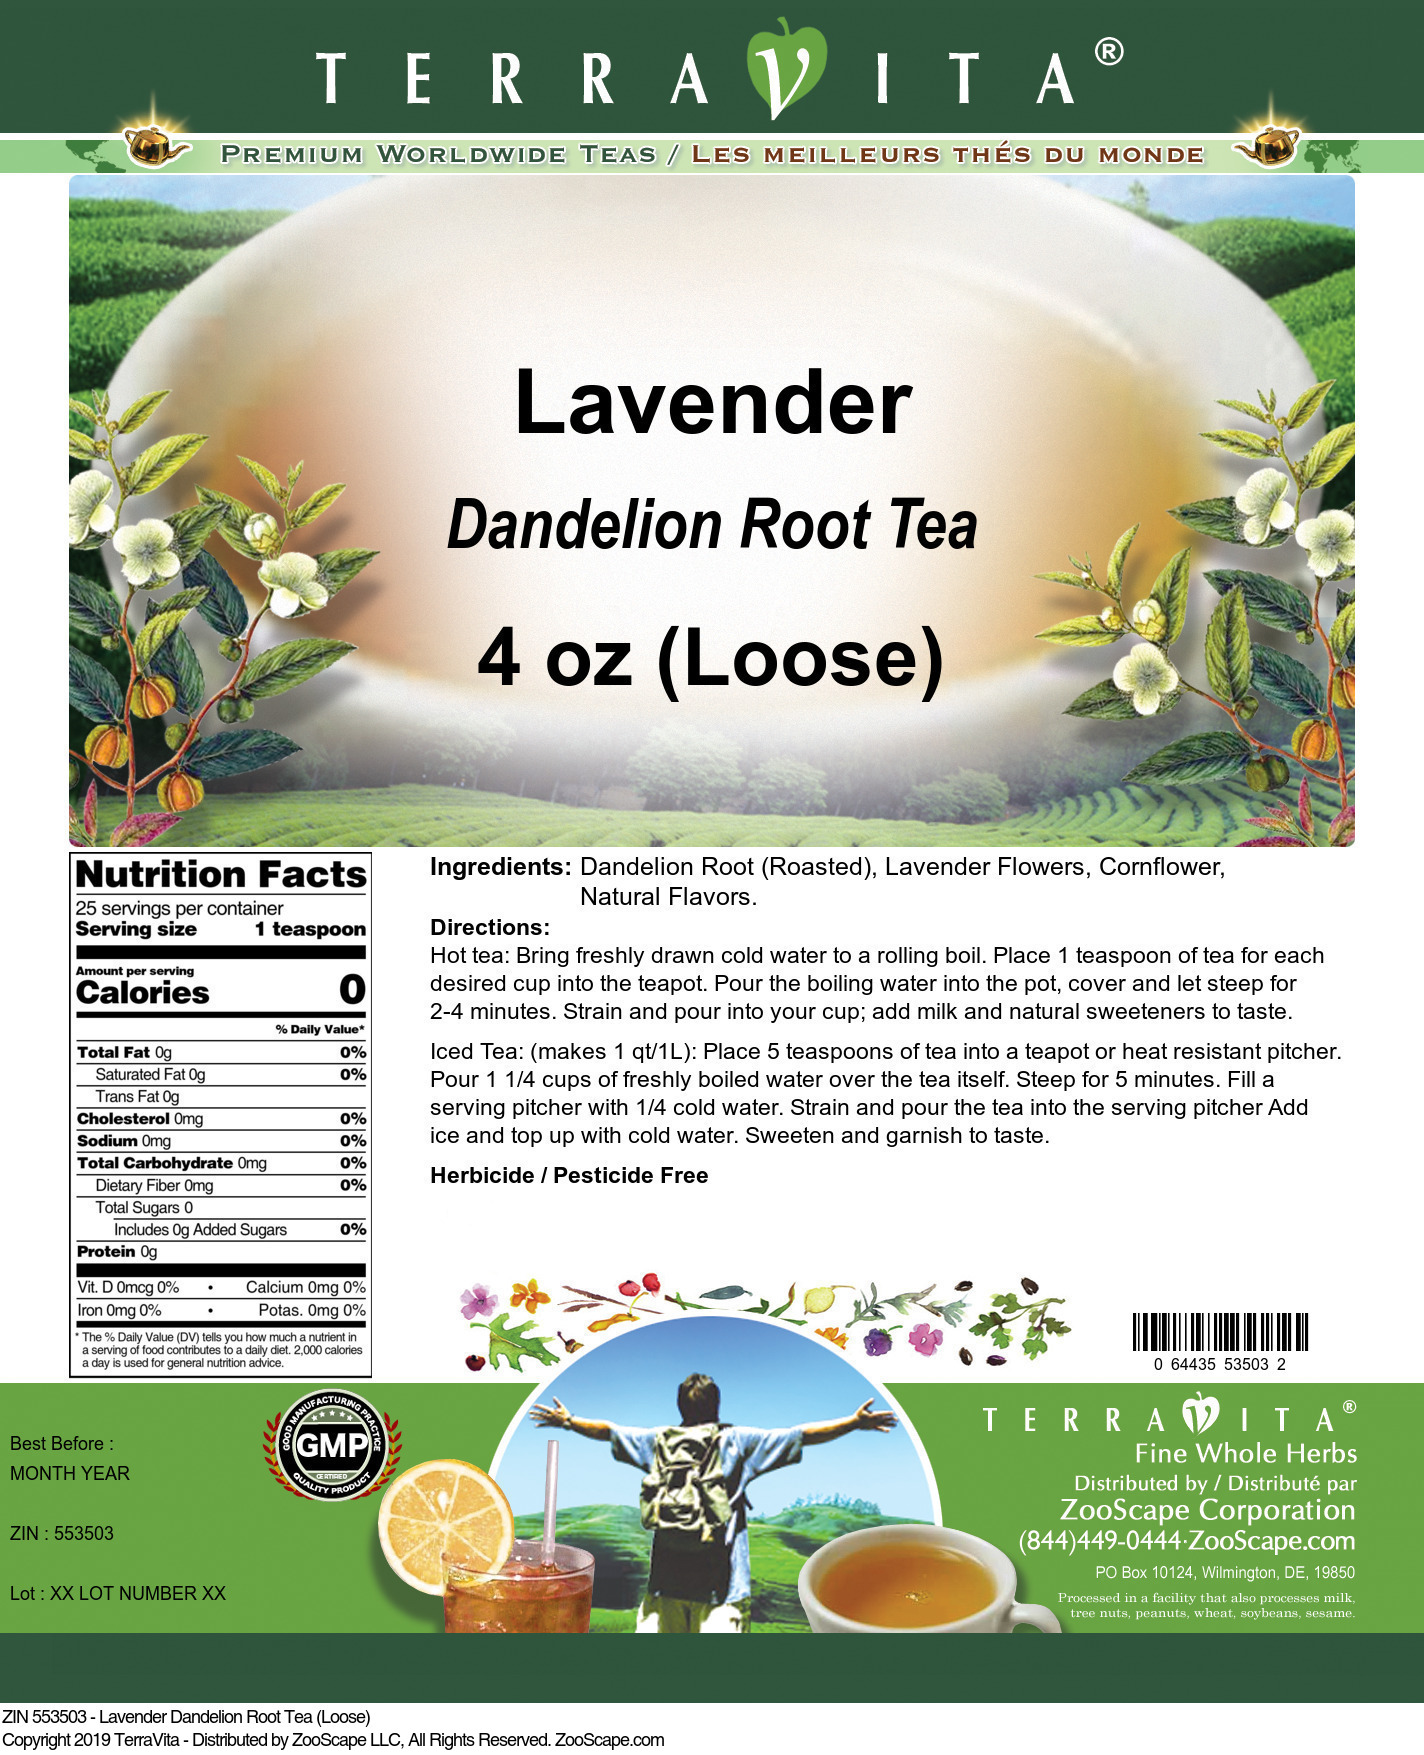 Lavender Dandelion Root